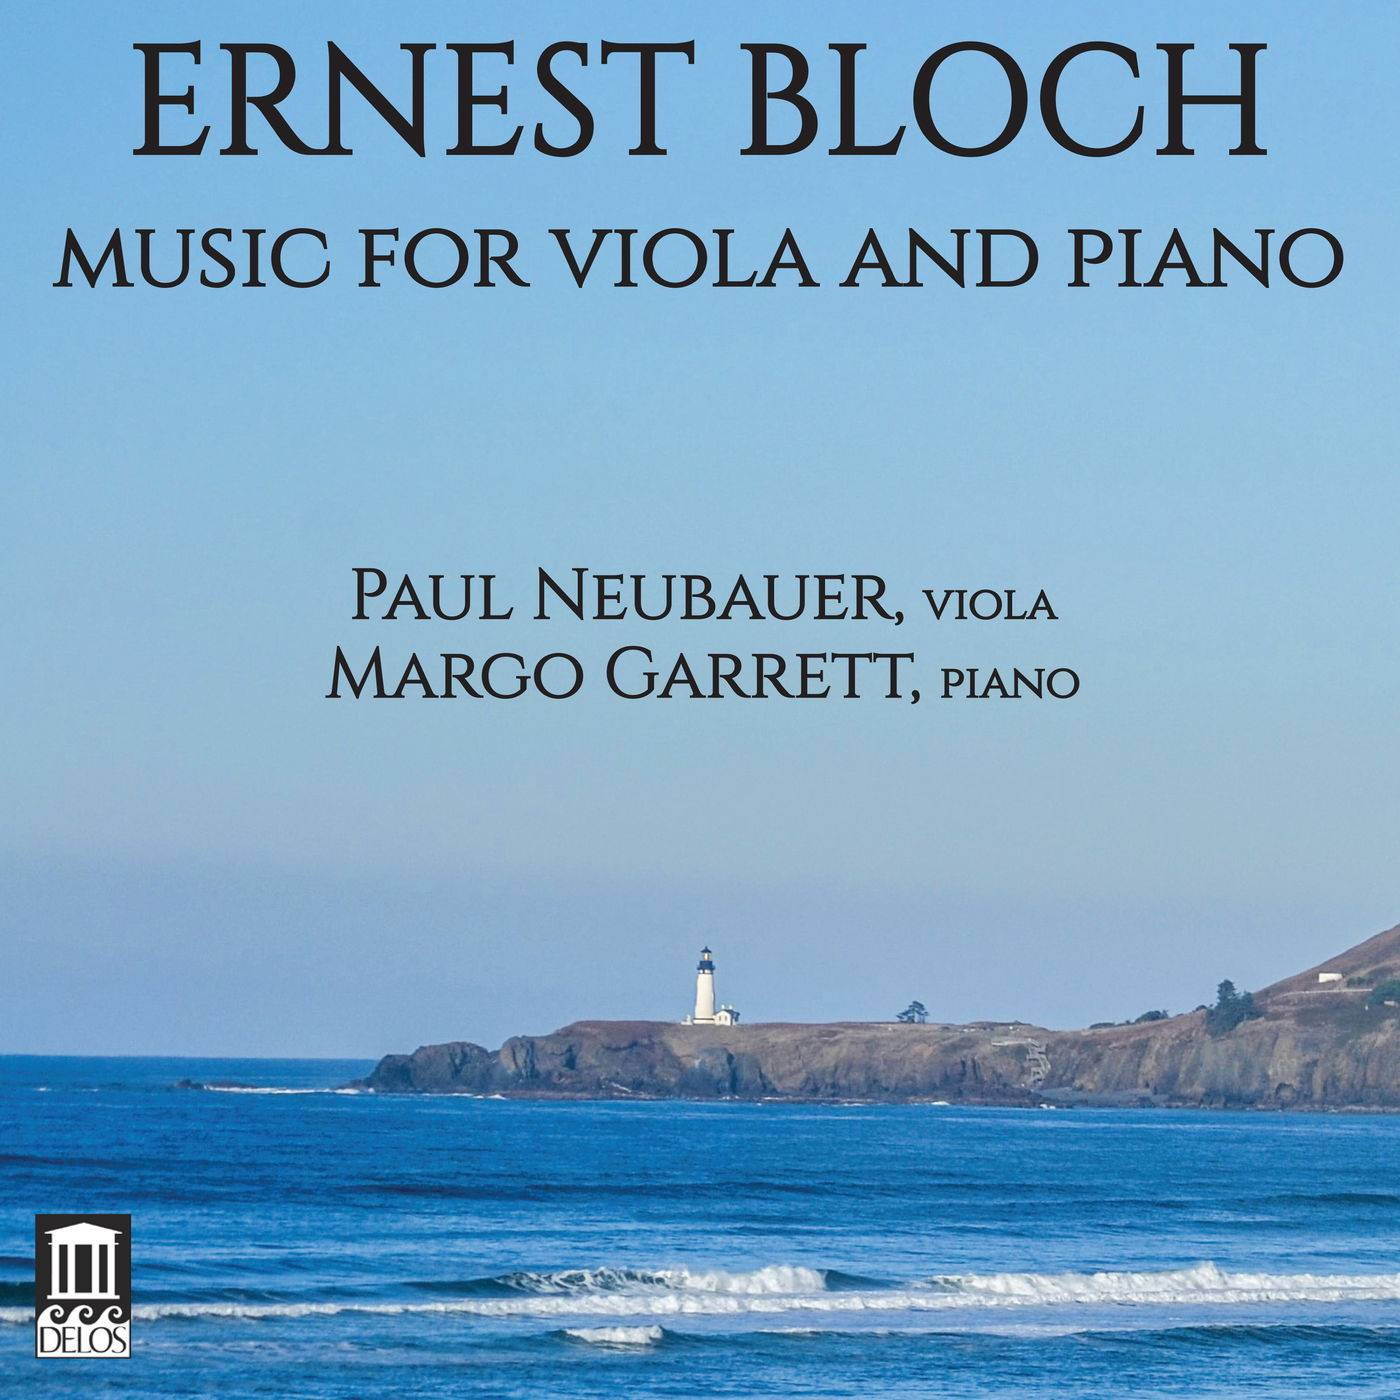 Paul Neubauer, Margo Garrett - Bloch: Music for Viola & Piano (2018)